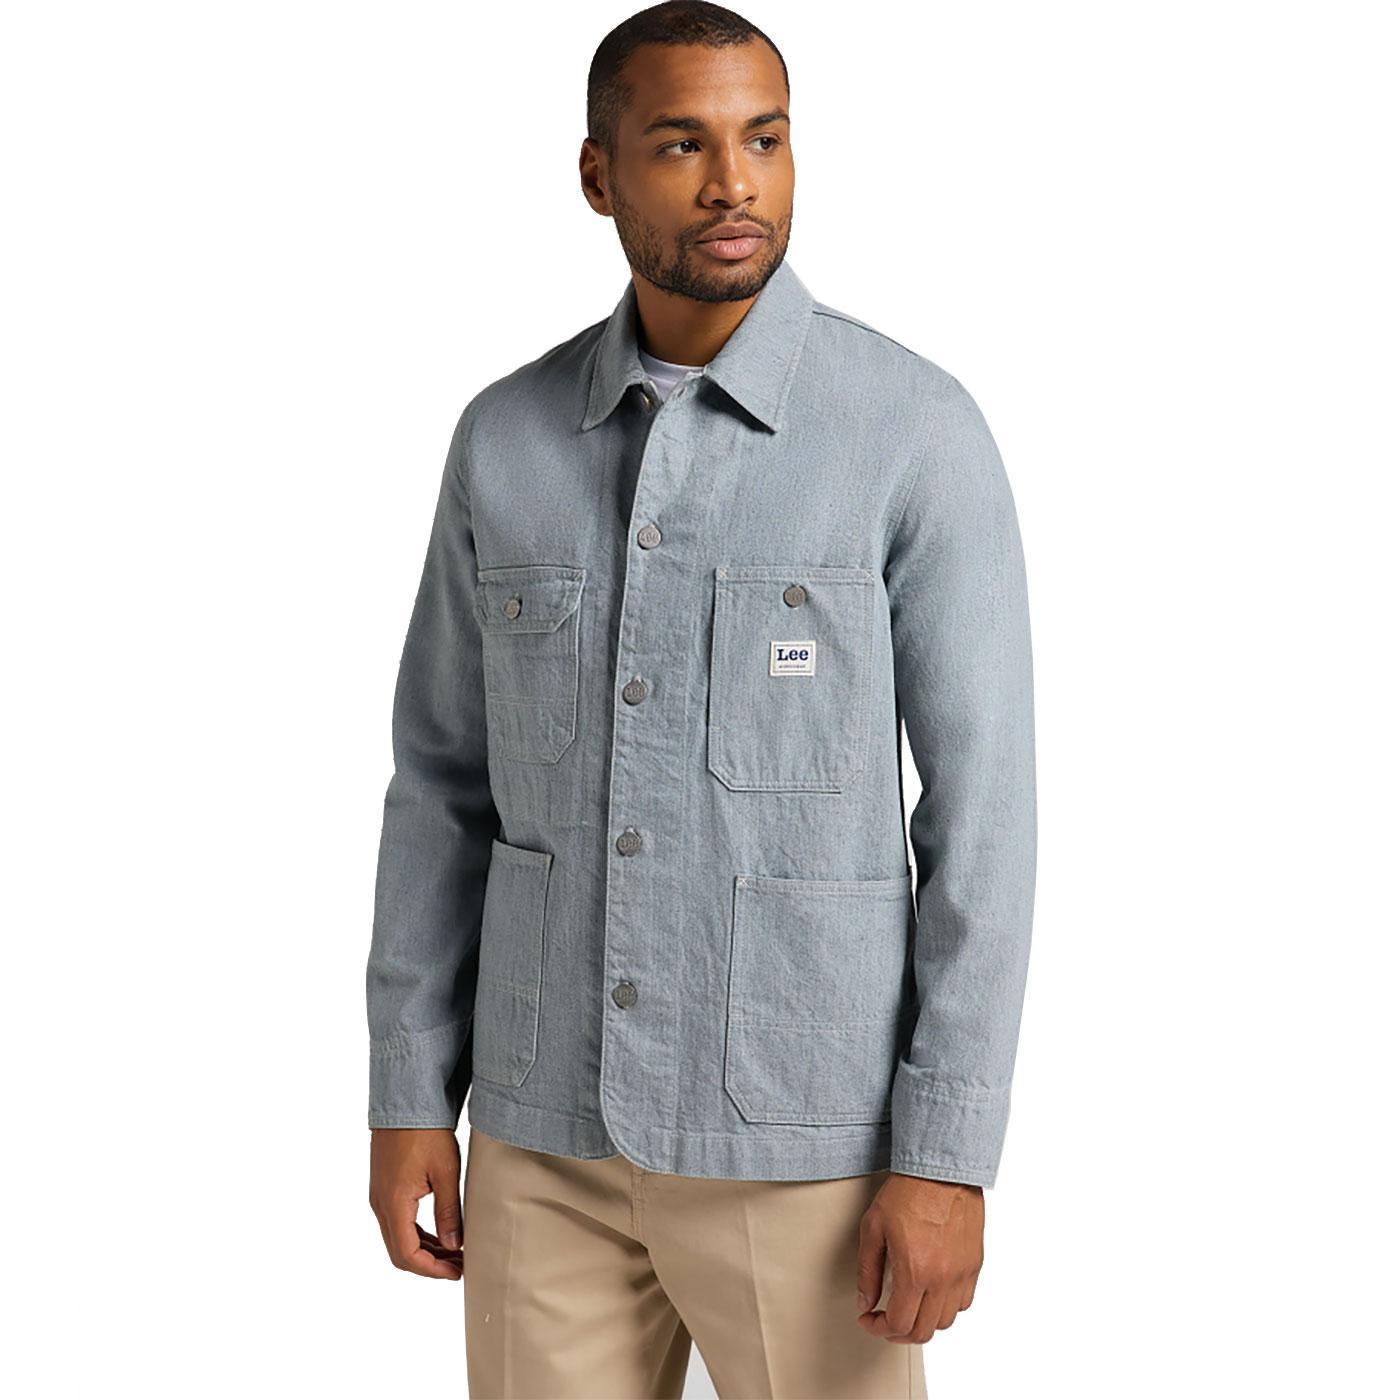 Loco LEE JEANS Box Pocket Denim Workwear Jacket